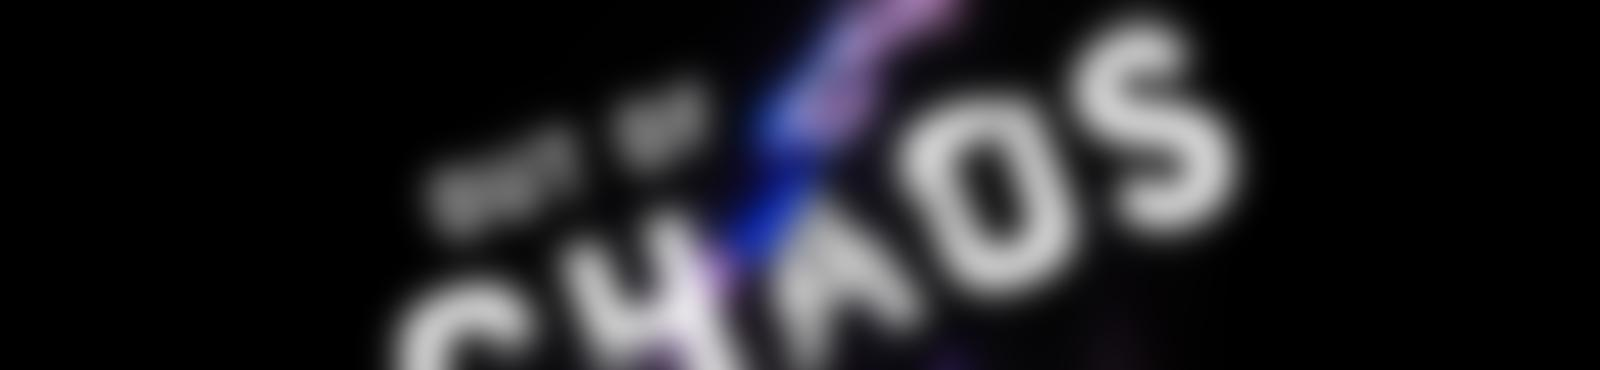 Blurred 2c2ecf97 c72e 471a ae23 cfd9175ac350